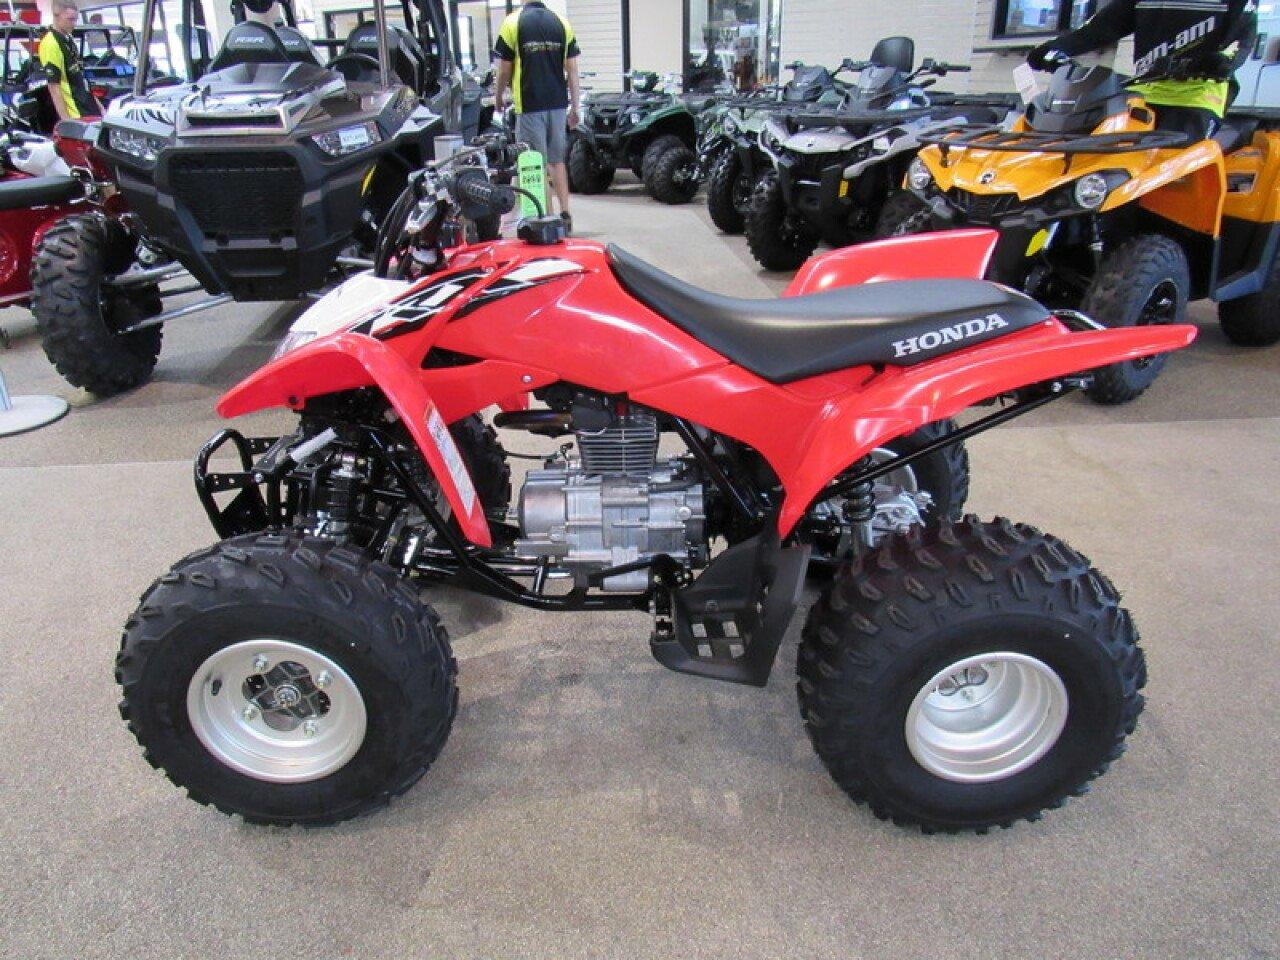 Kbb Value Atv >> 2018 Honda TRX250X for sale near Goodyear, Arizona 85338 - Motorcycles on Autotrader